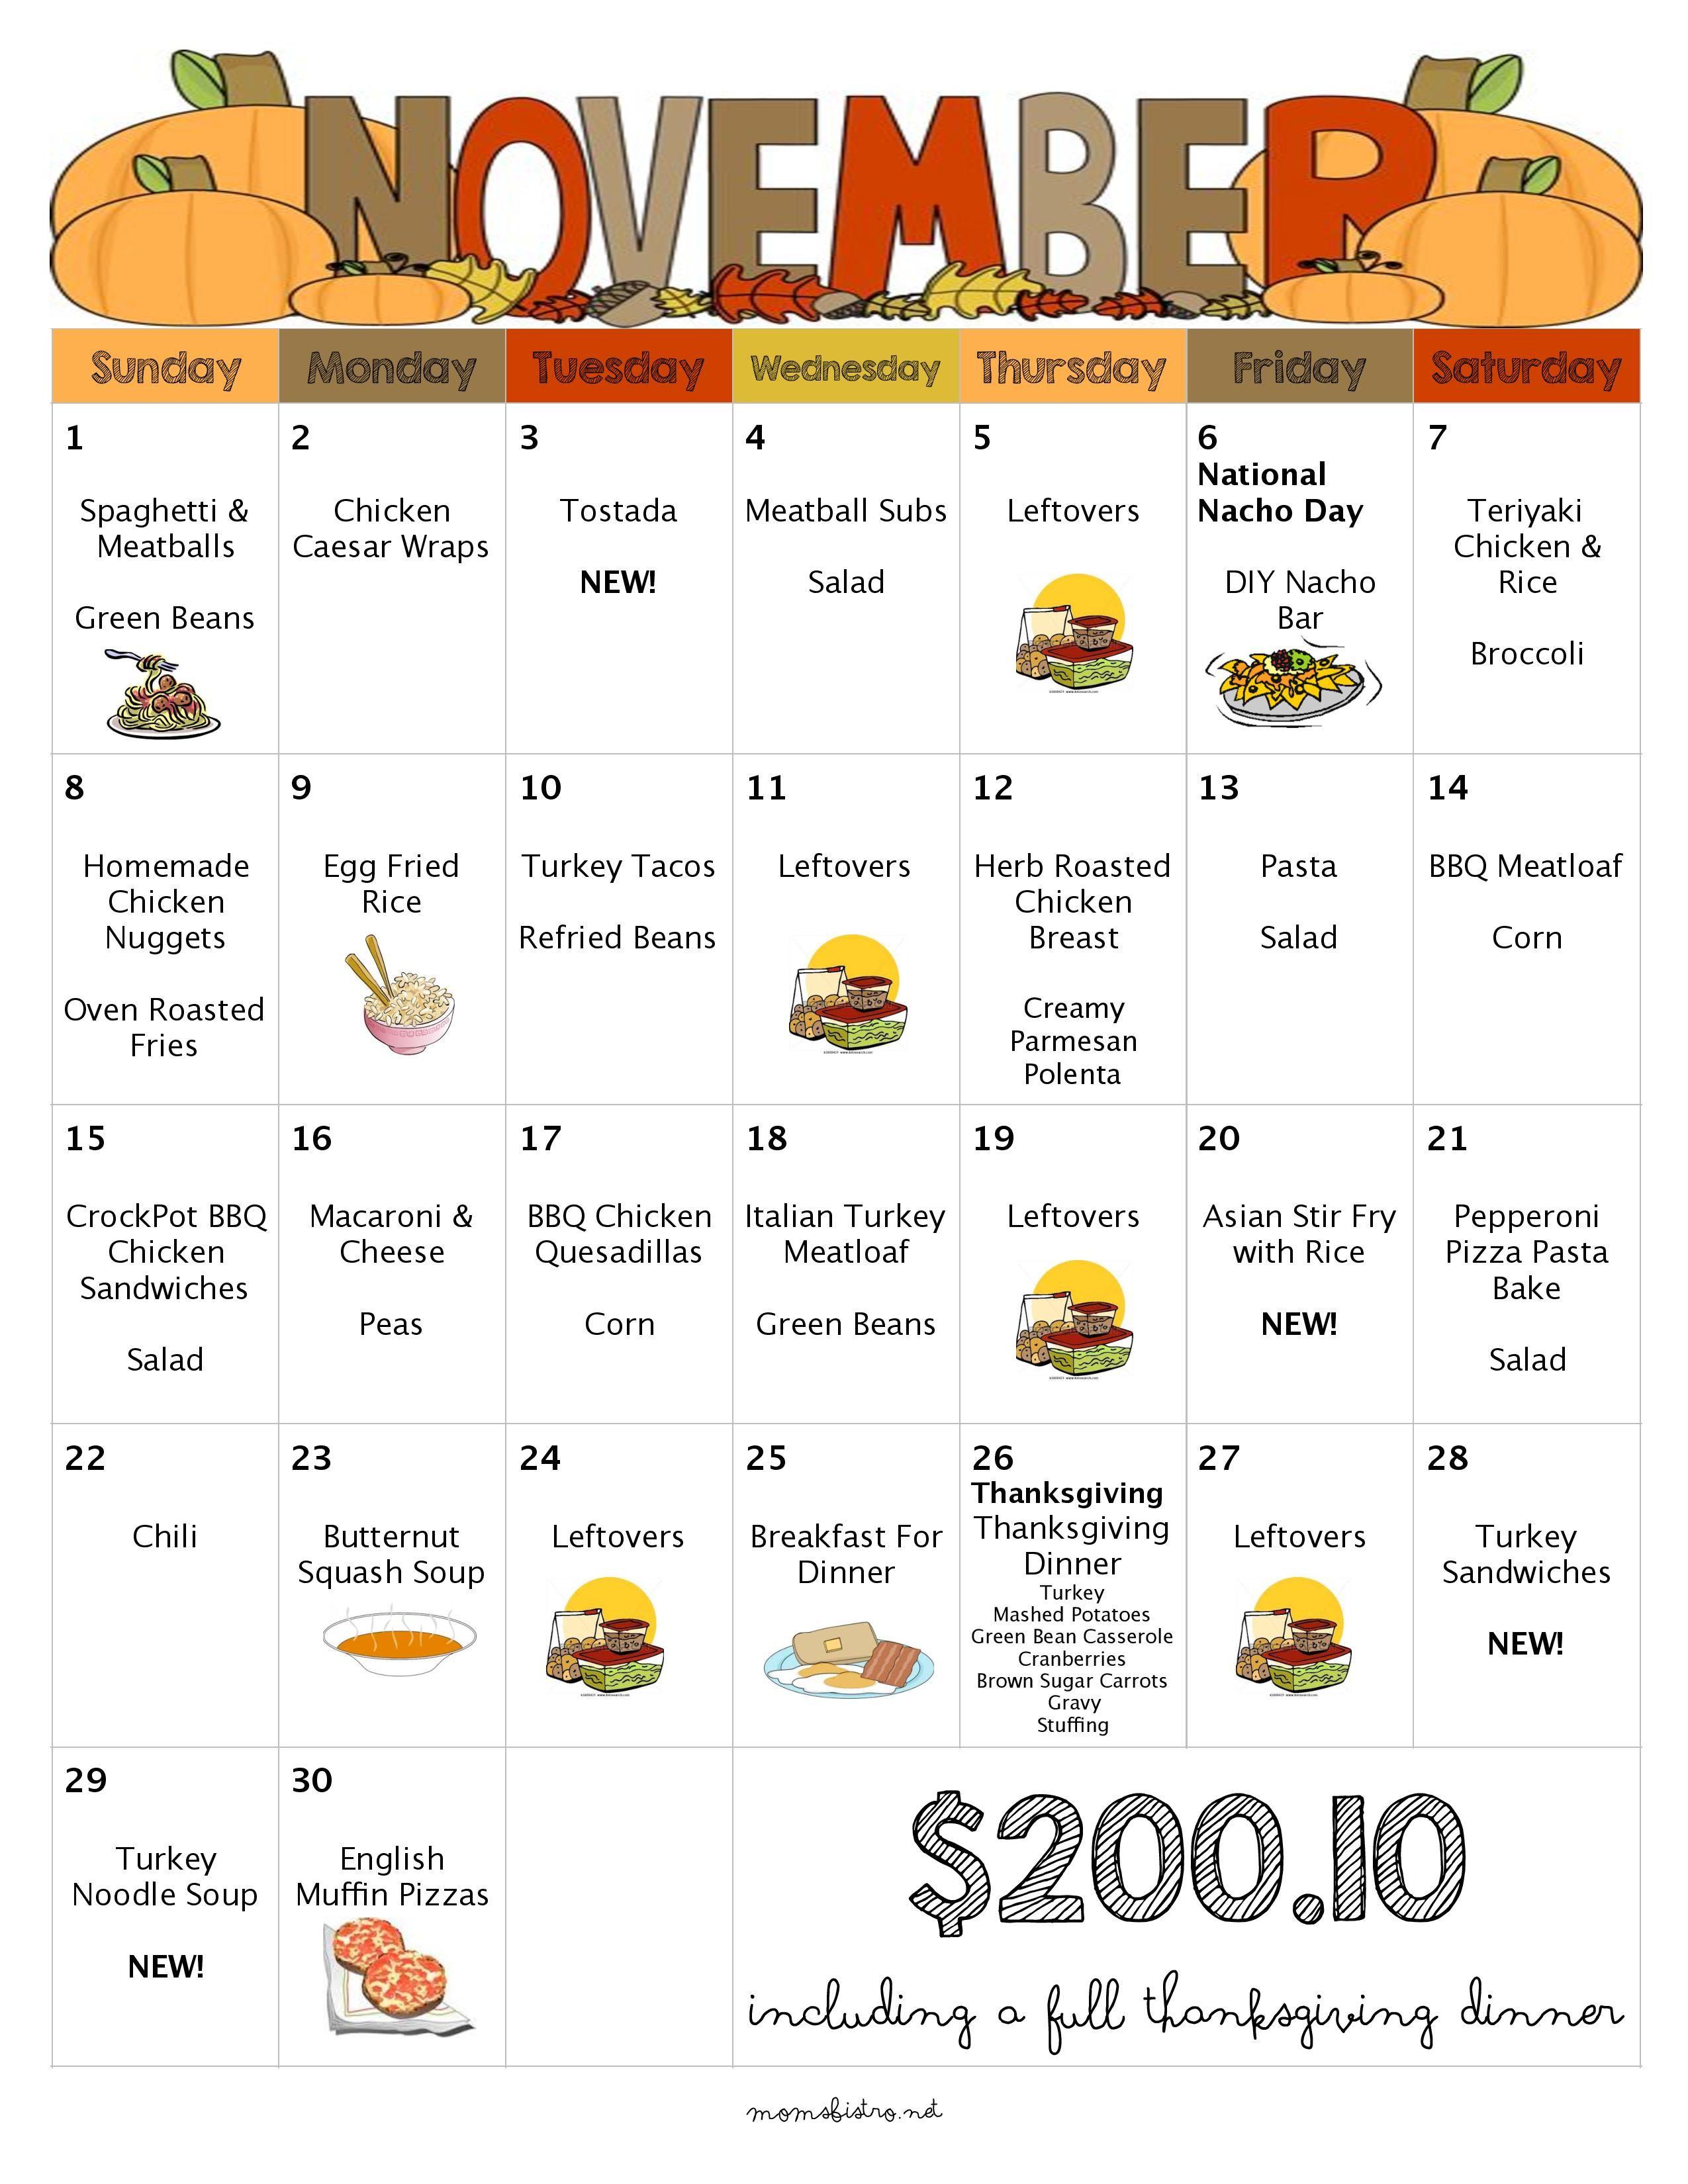 November Menu Free Printable Grocery List Thanksgiving Dinner Leftovers Kid Friendly Recipes Weekly Moms Bistro